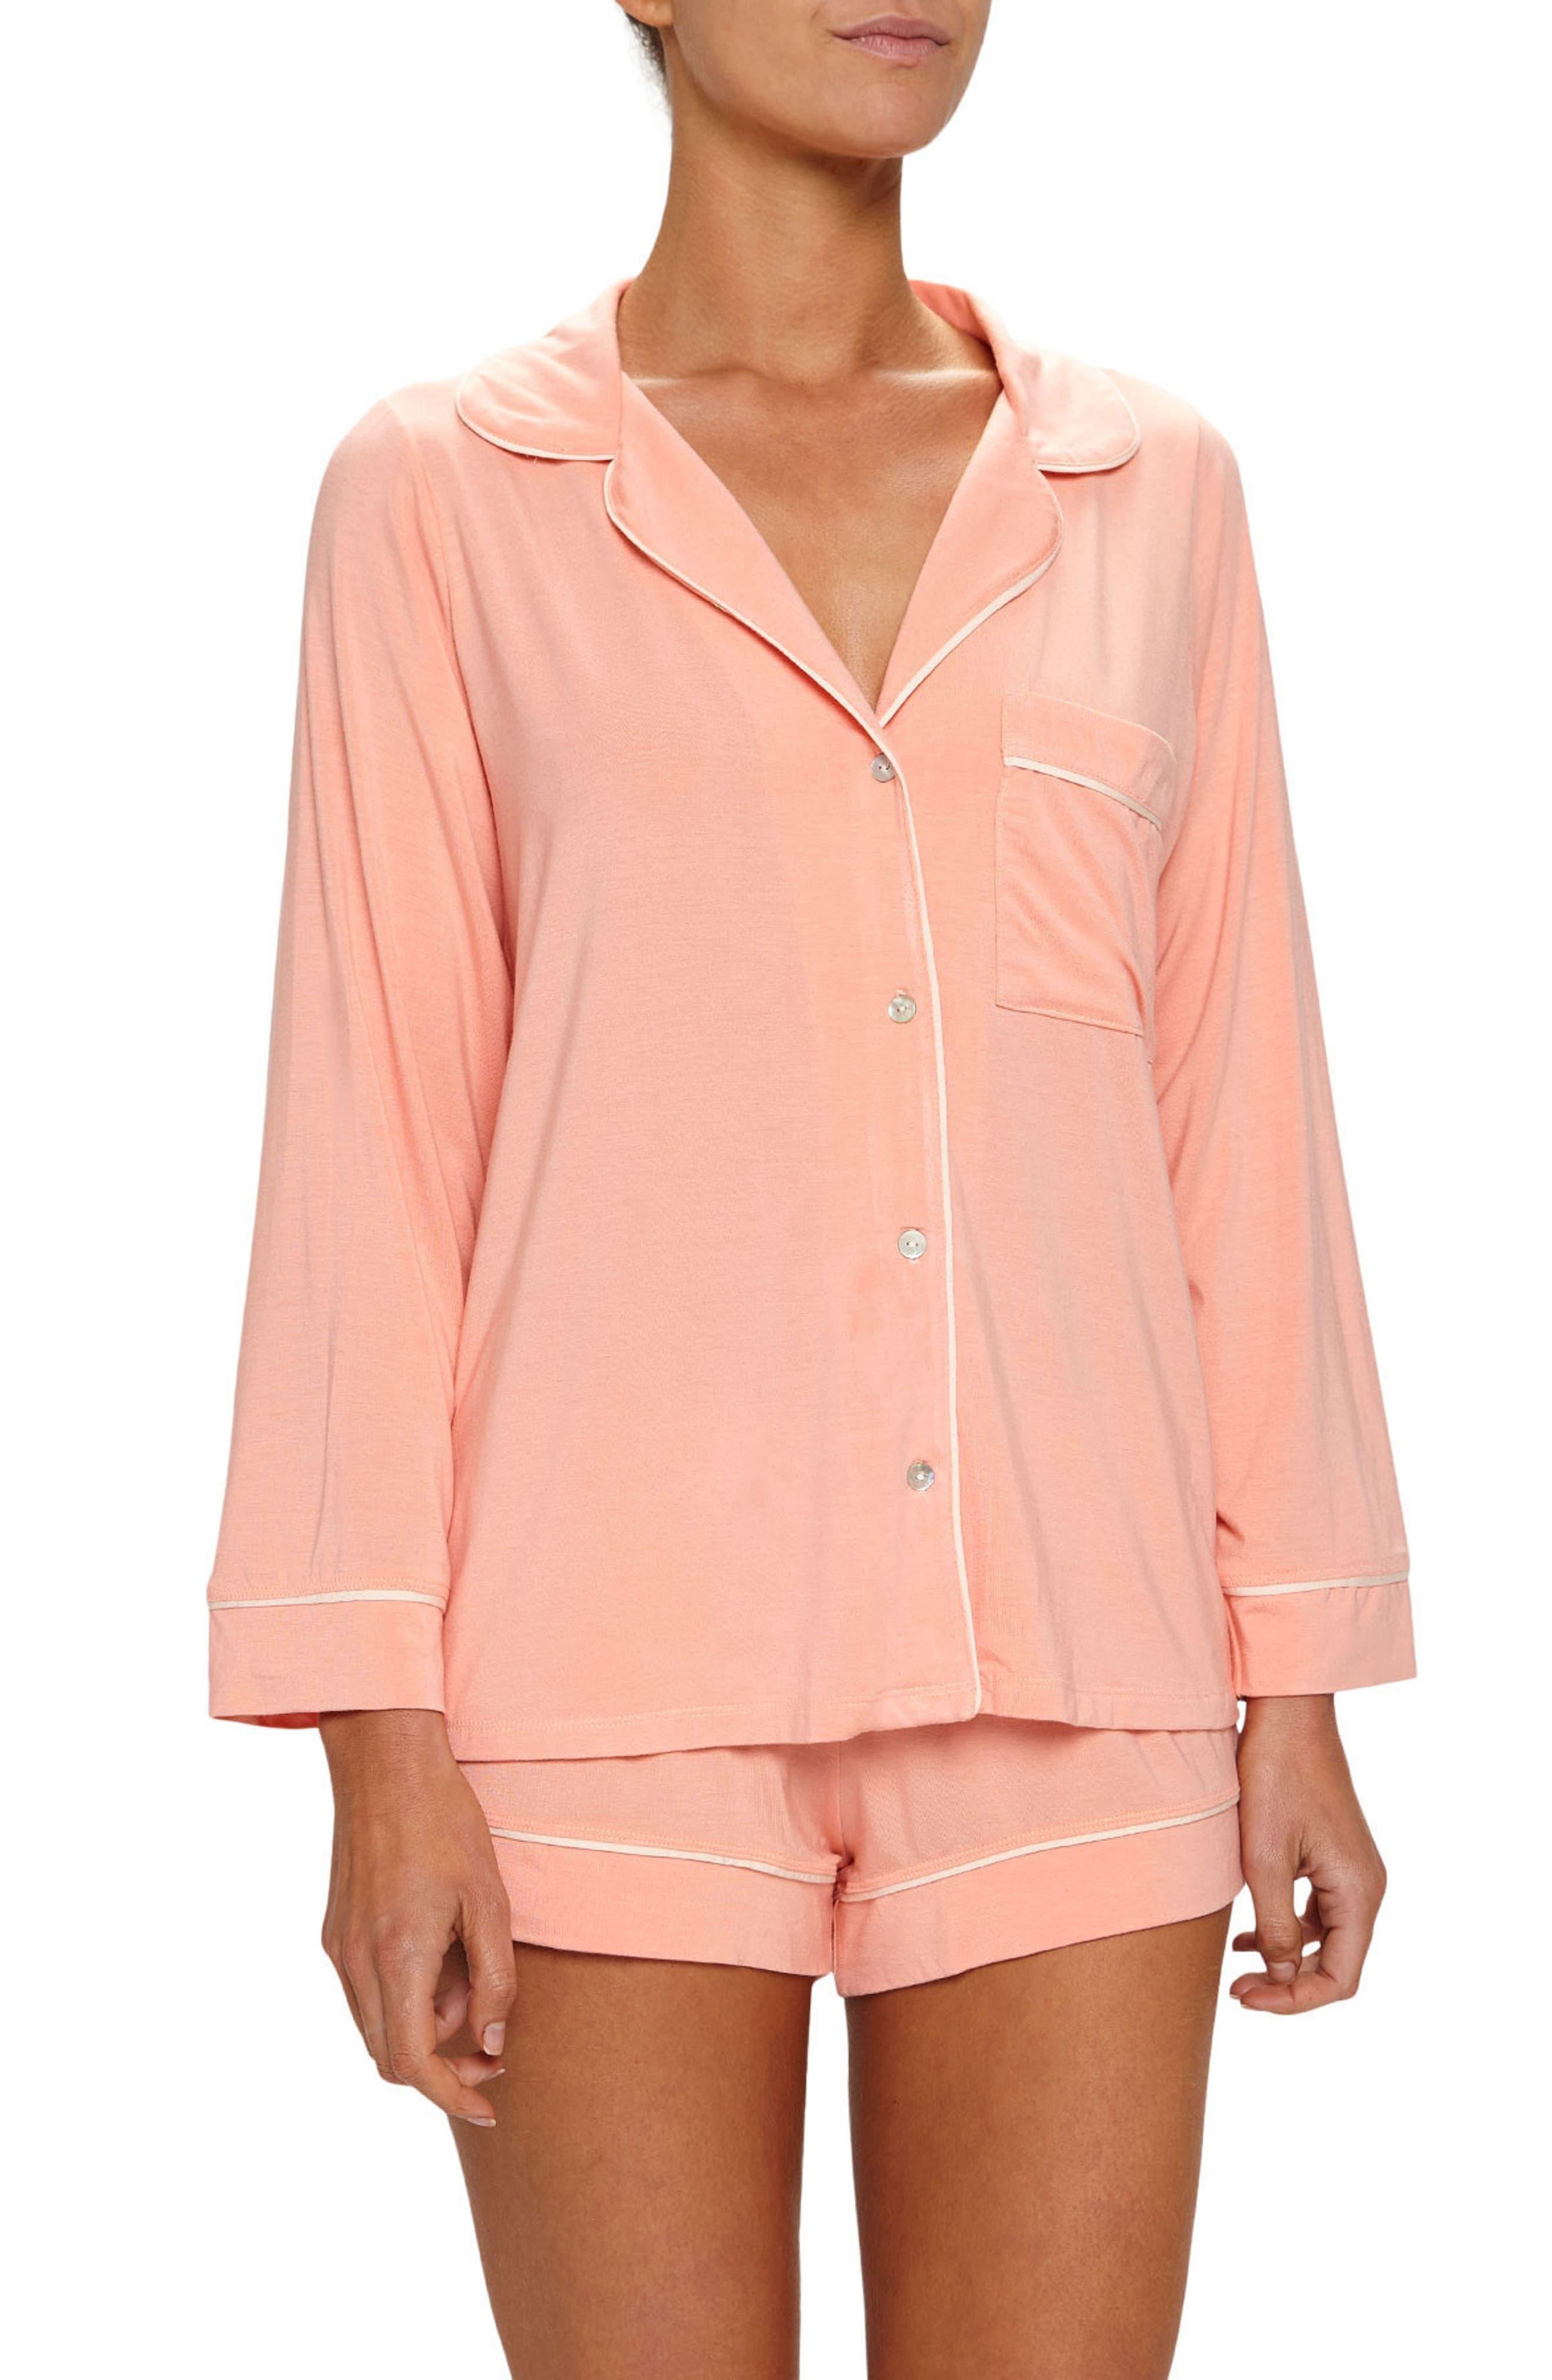 'Gisele' Short Pajamas,                             Main thumbnail 1, color,                             Guava/ Bellini